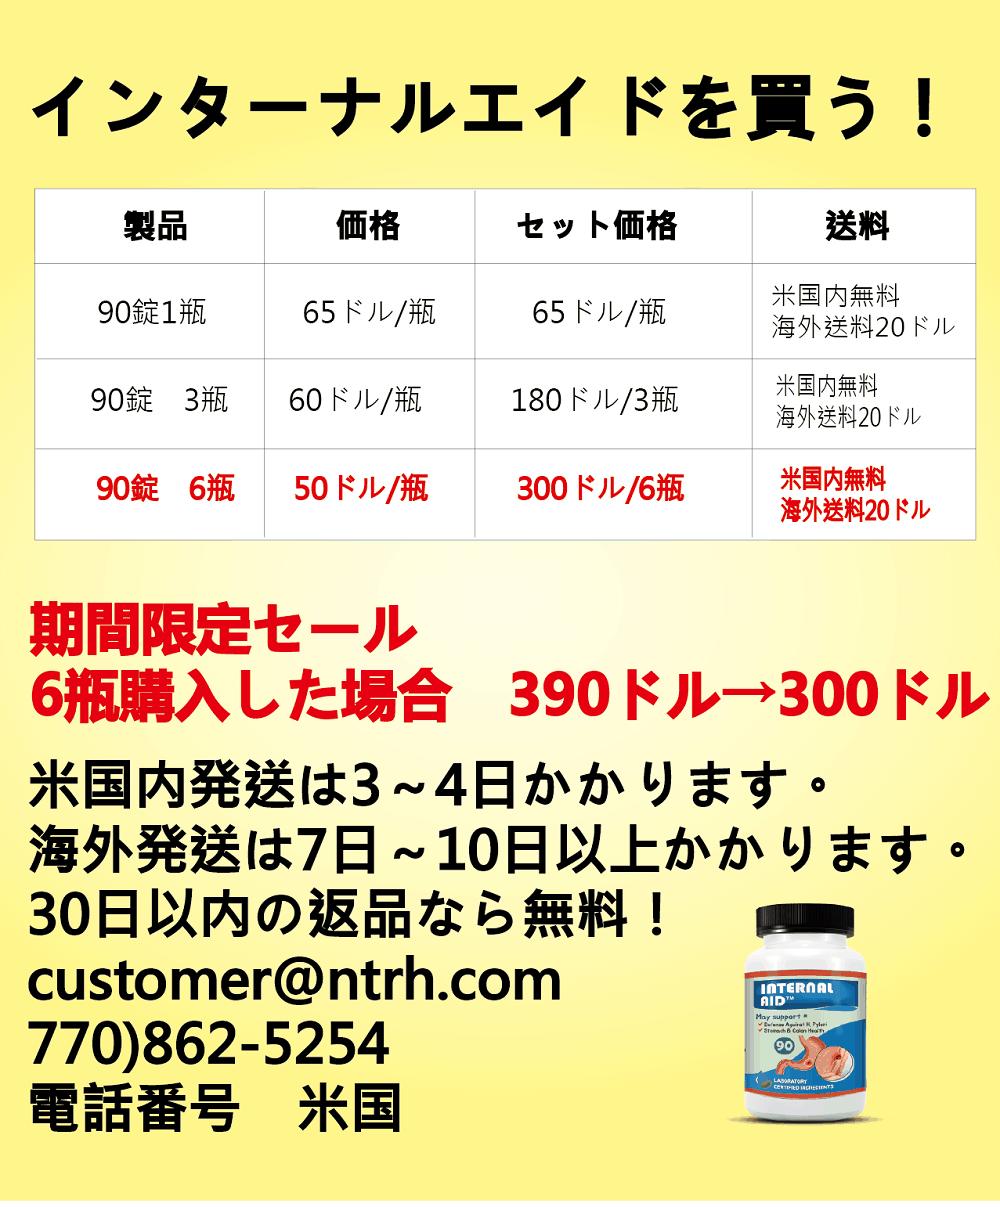 InternalAid Webpage.order.png